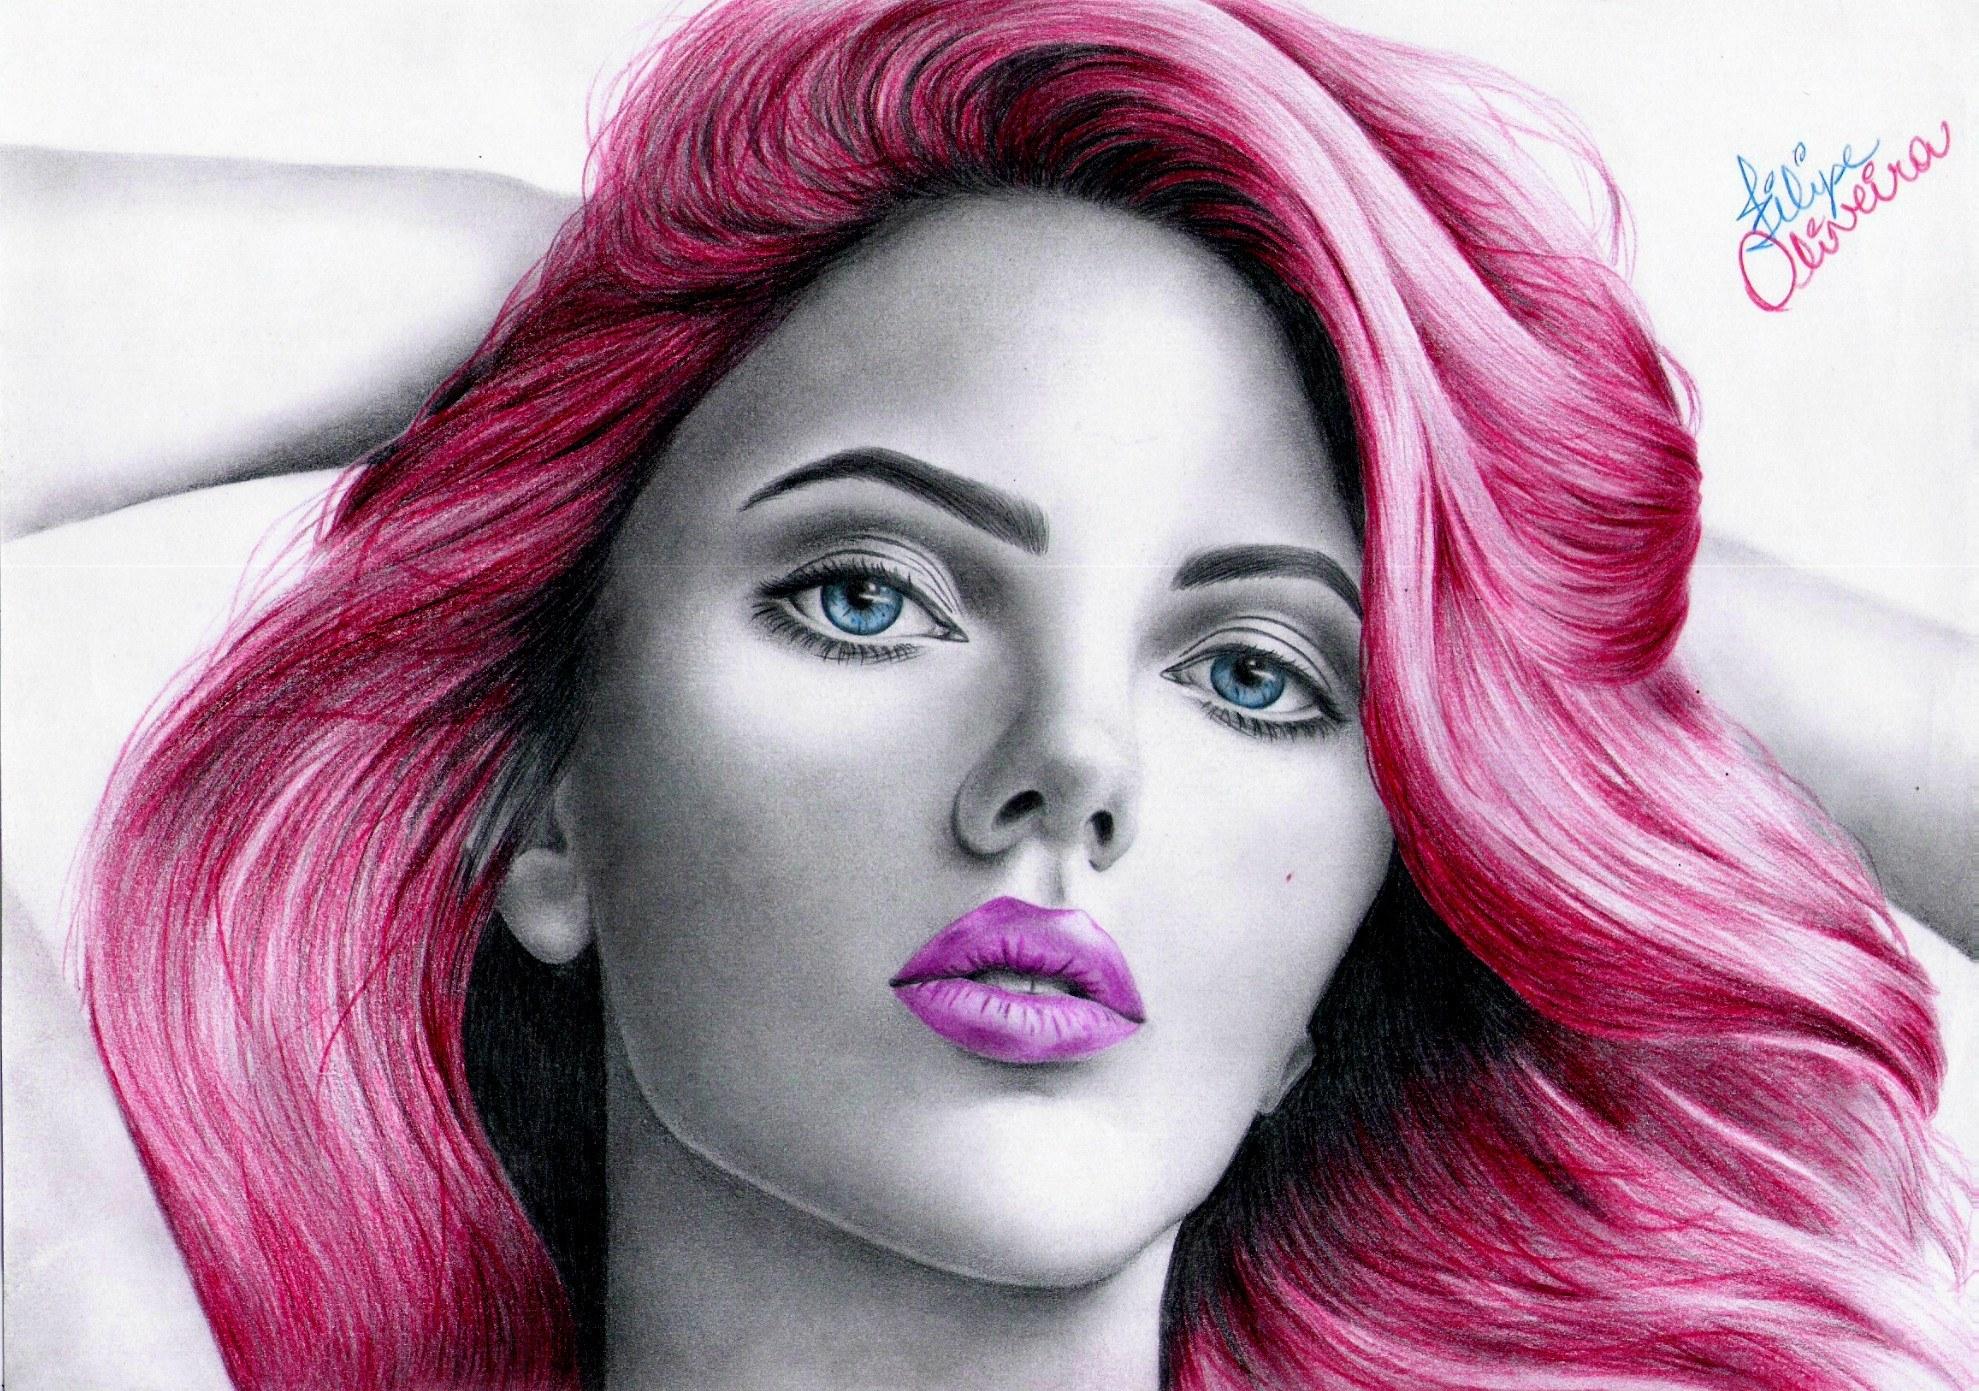 Marvel - Black Widow - Scarlett Johansson by filipeoliveira